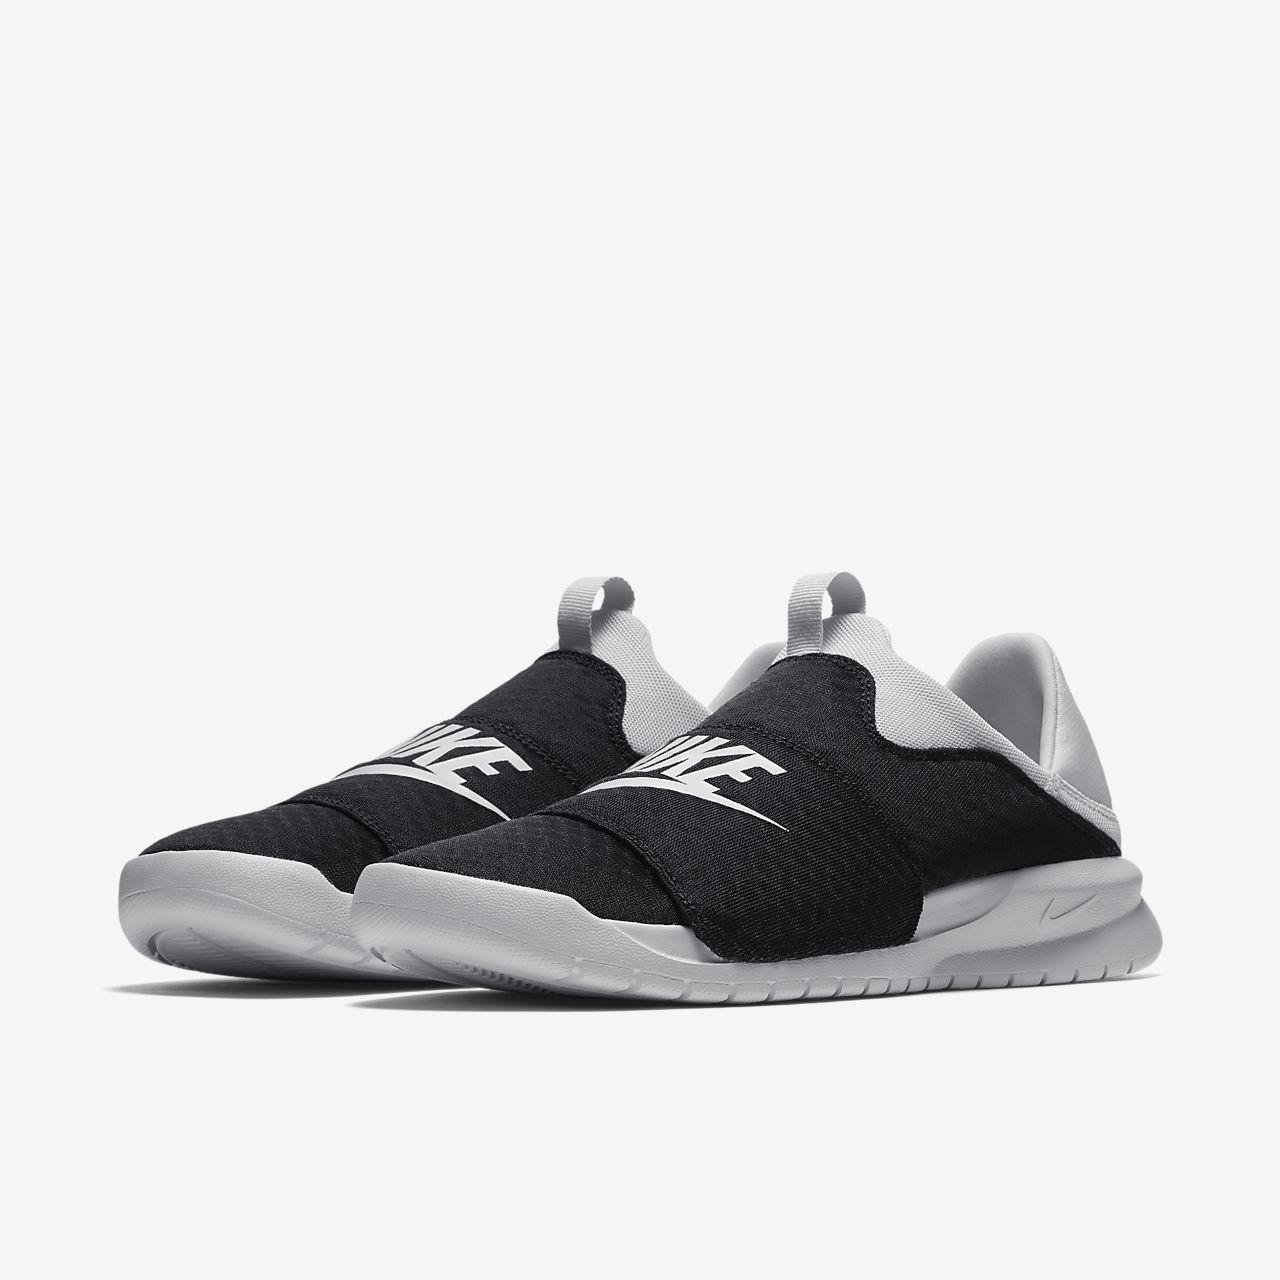 Nike Benassi Slip Shoe | Nike benassi